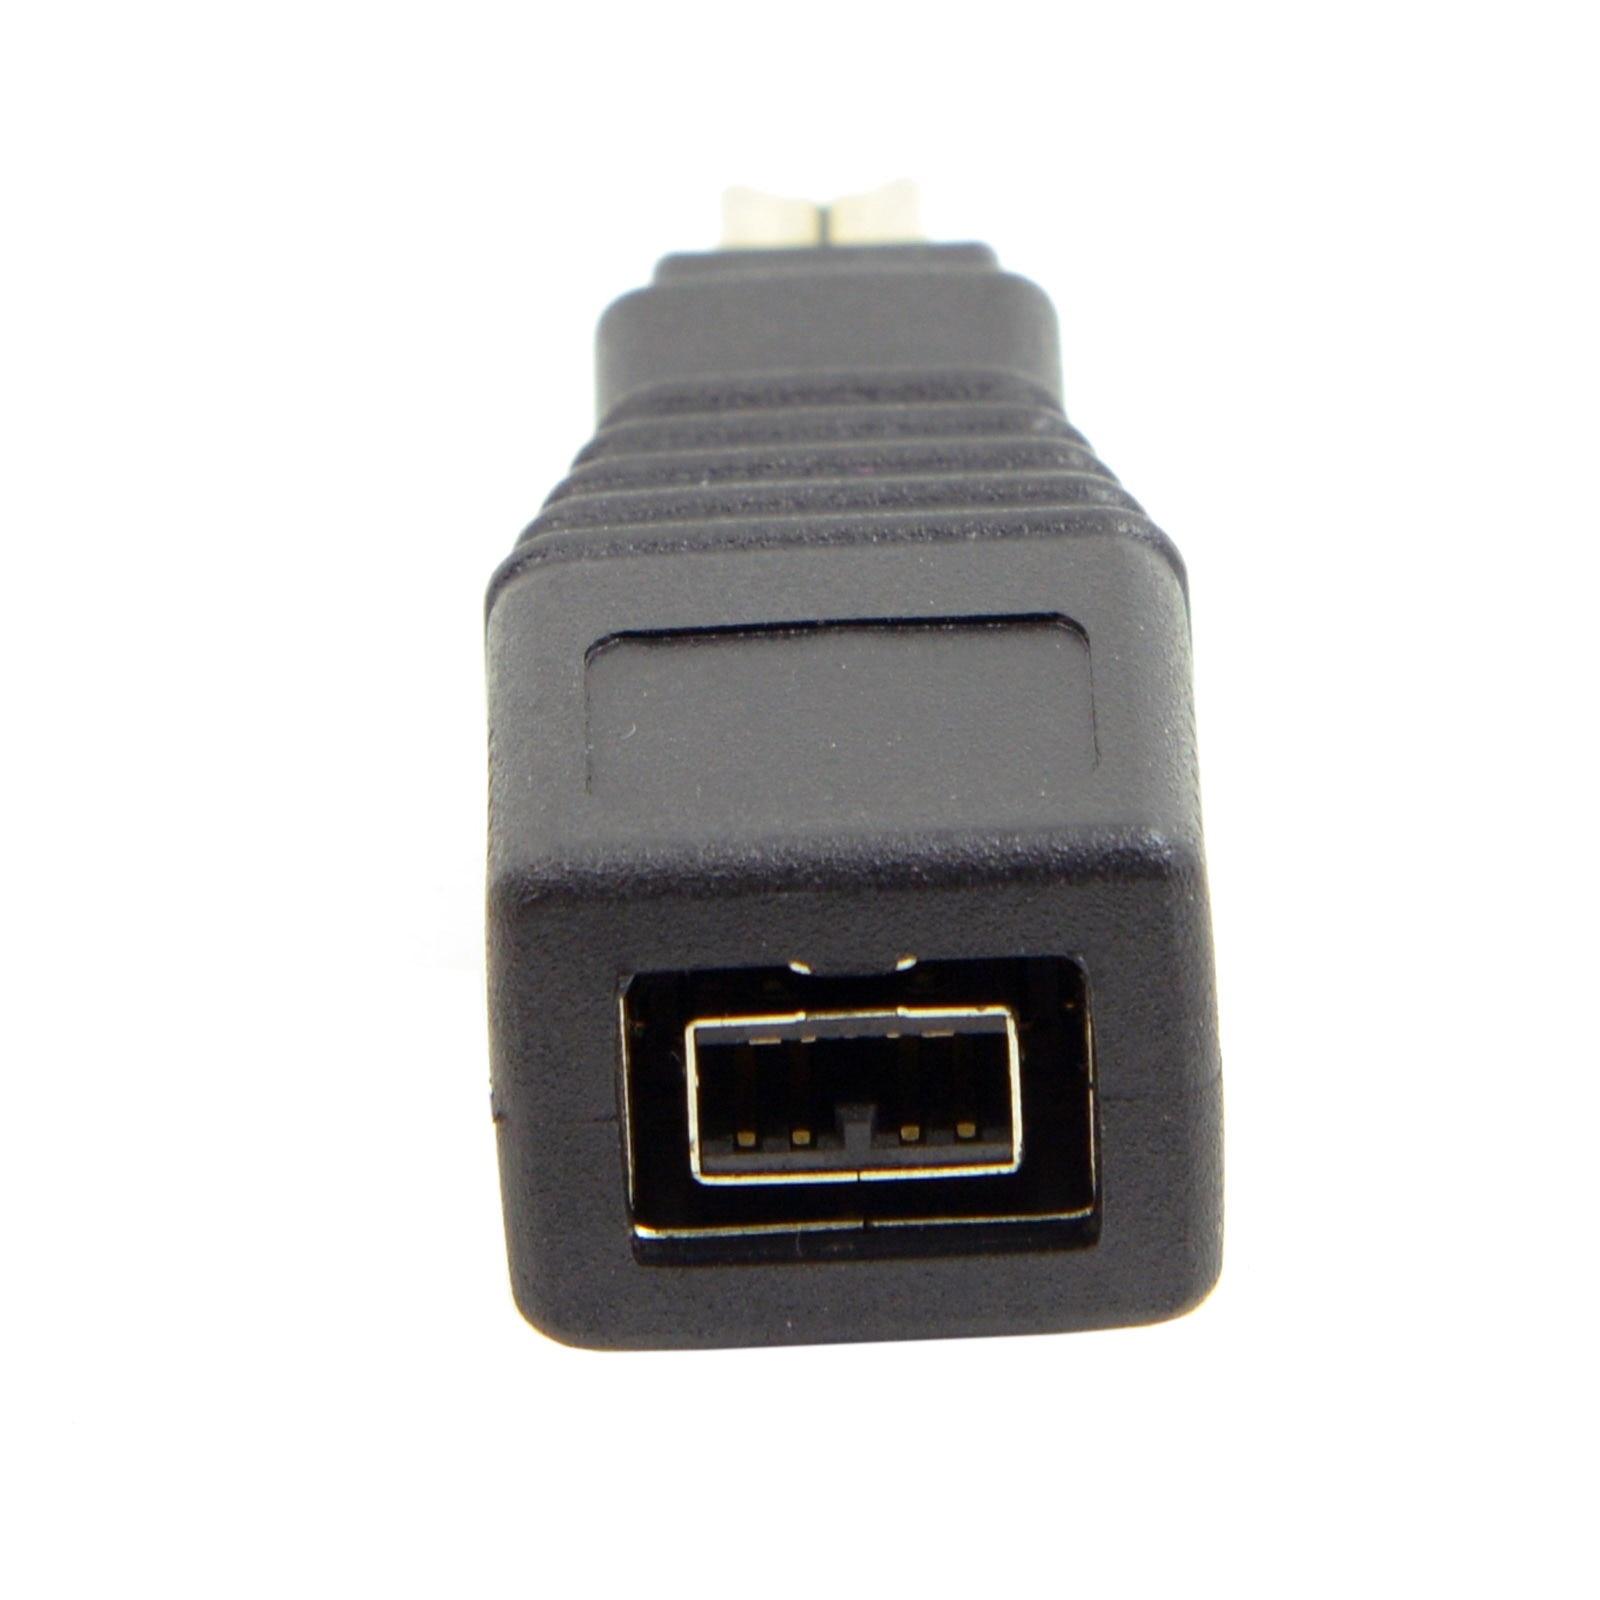 Excellent Firewire 800 Usb Port Converter Images - Electrical ...